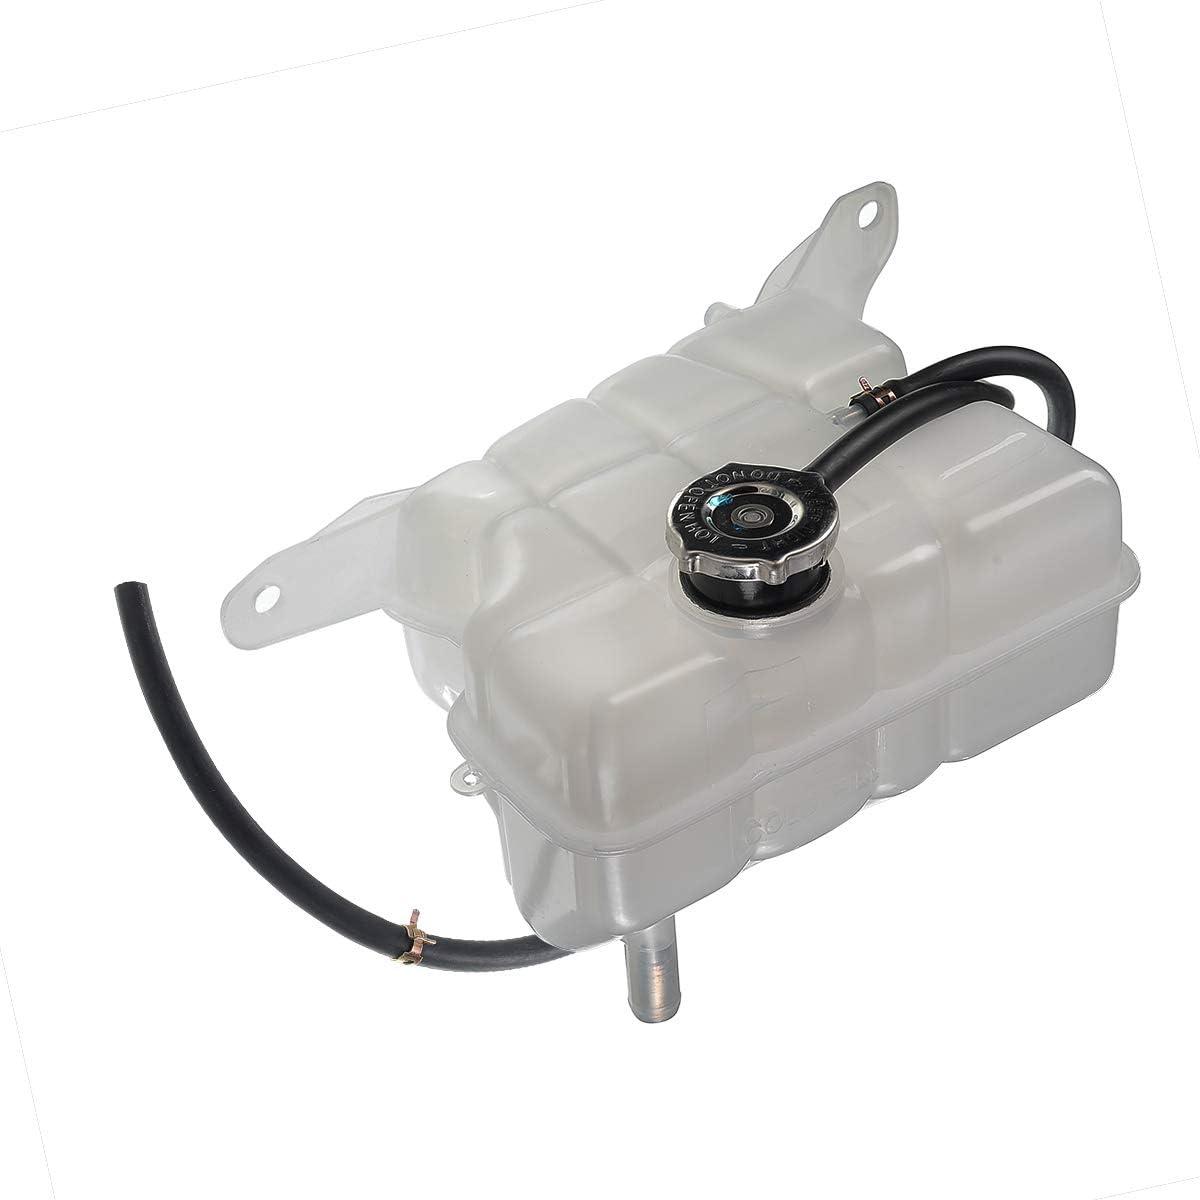 A-Premium Coolant Expansion Tank Compatible with Jeep KJ Liberty 2002-2007 Front